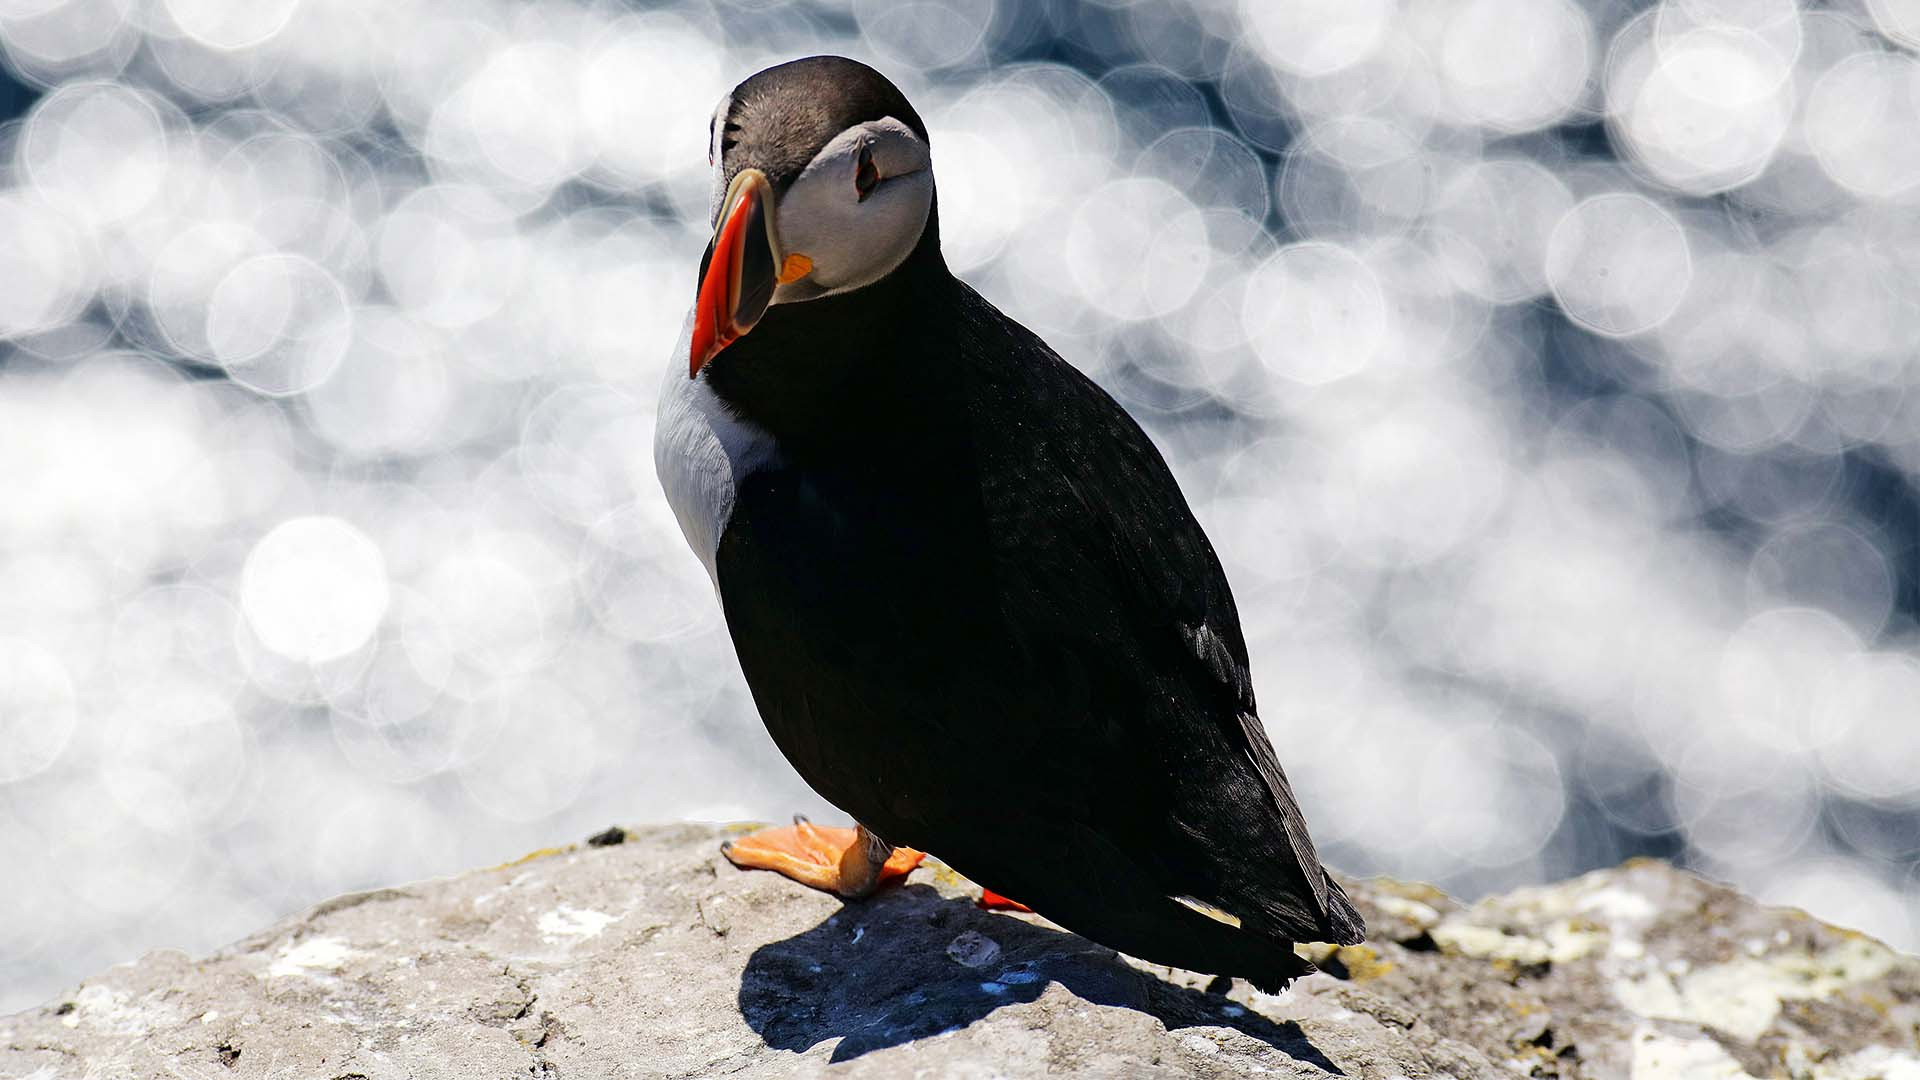 A puffin on the Atlantic coast of Ireland